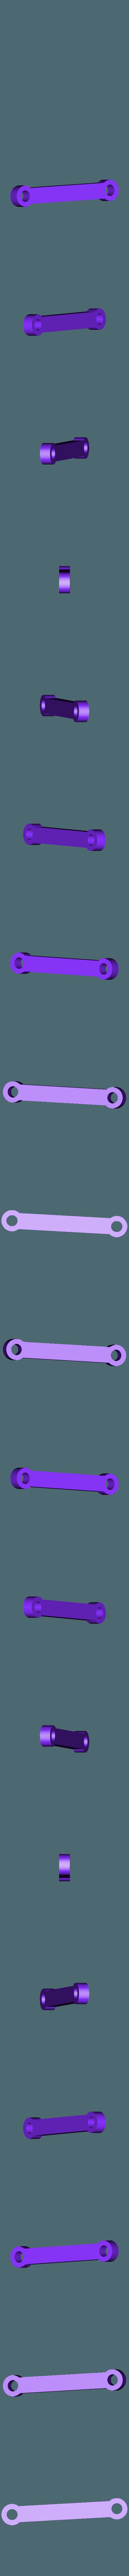 Arm_DB.stl Download free STL file Marblevator, Mechanisms • Object to 3D print, gzumwalt